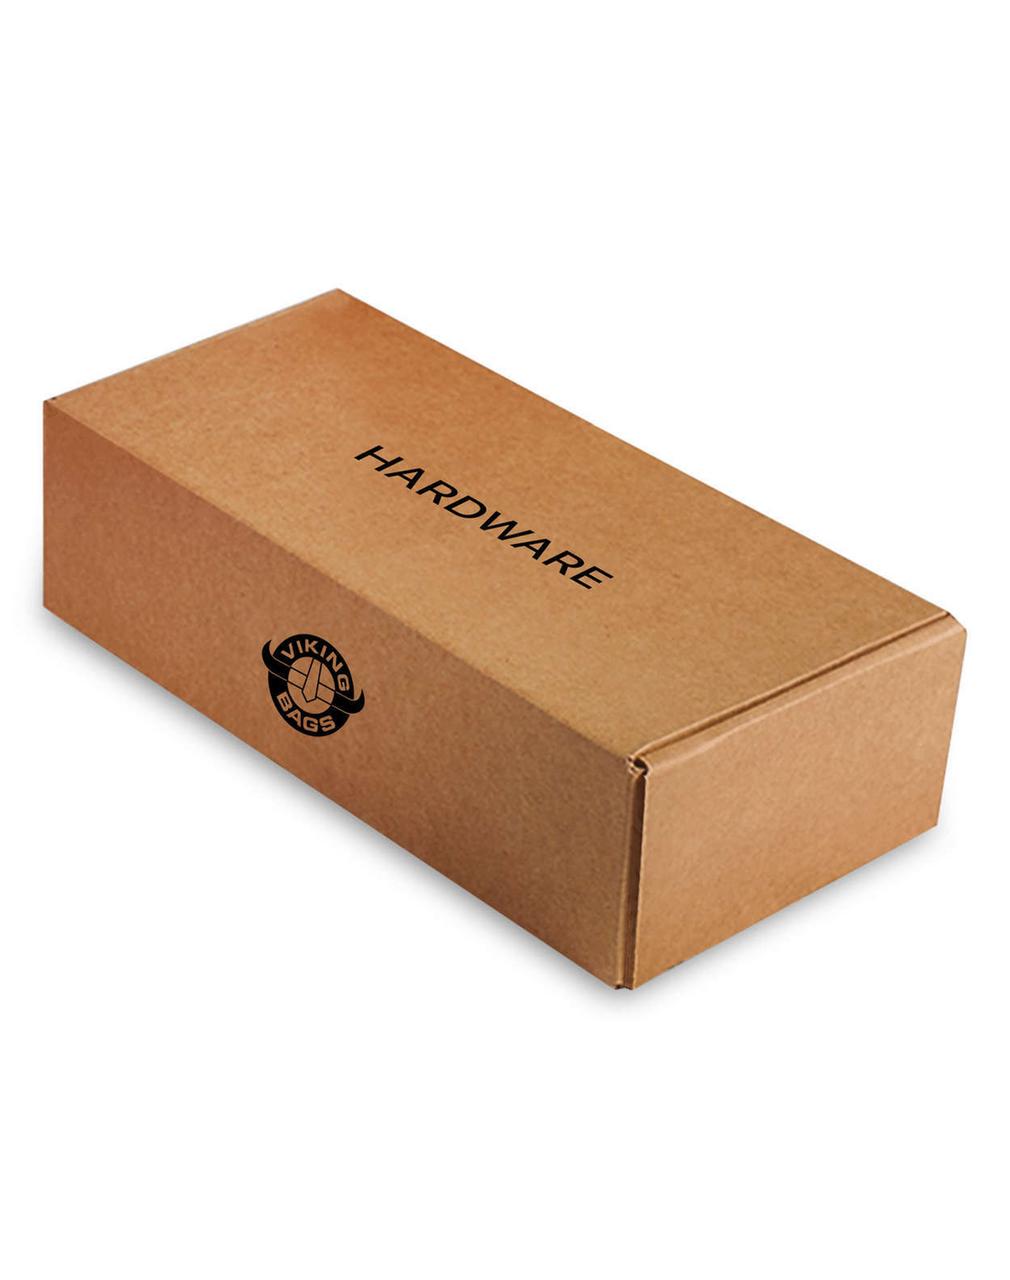 Honda VTX 1800 N Lamellar Extra Large Shock Cutout Saddlebag Box